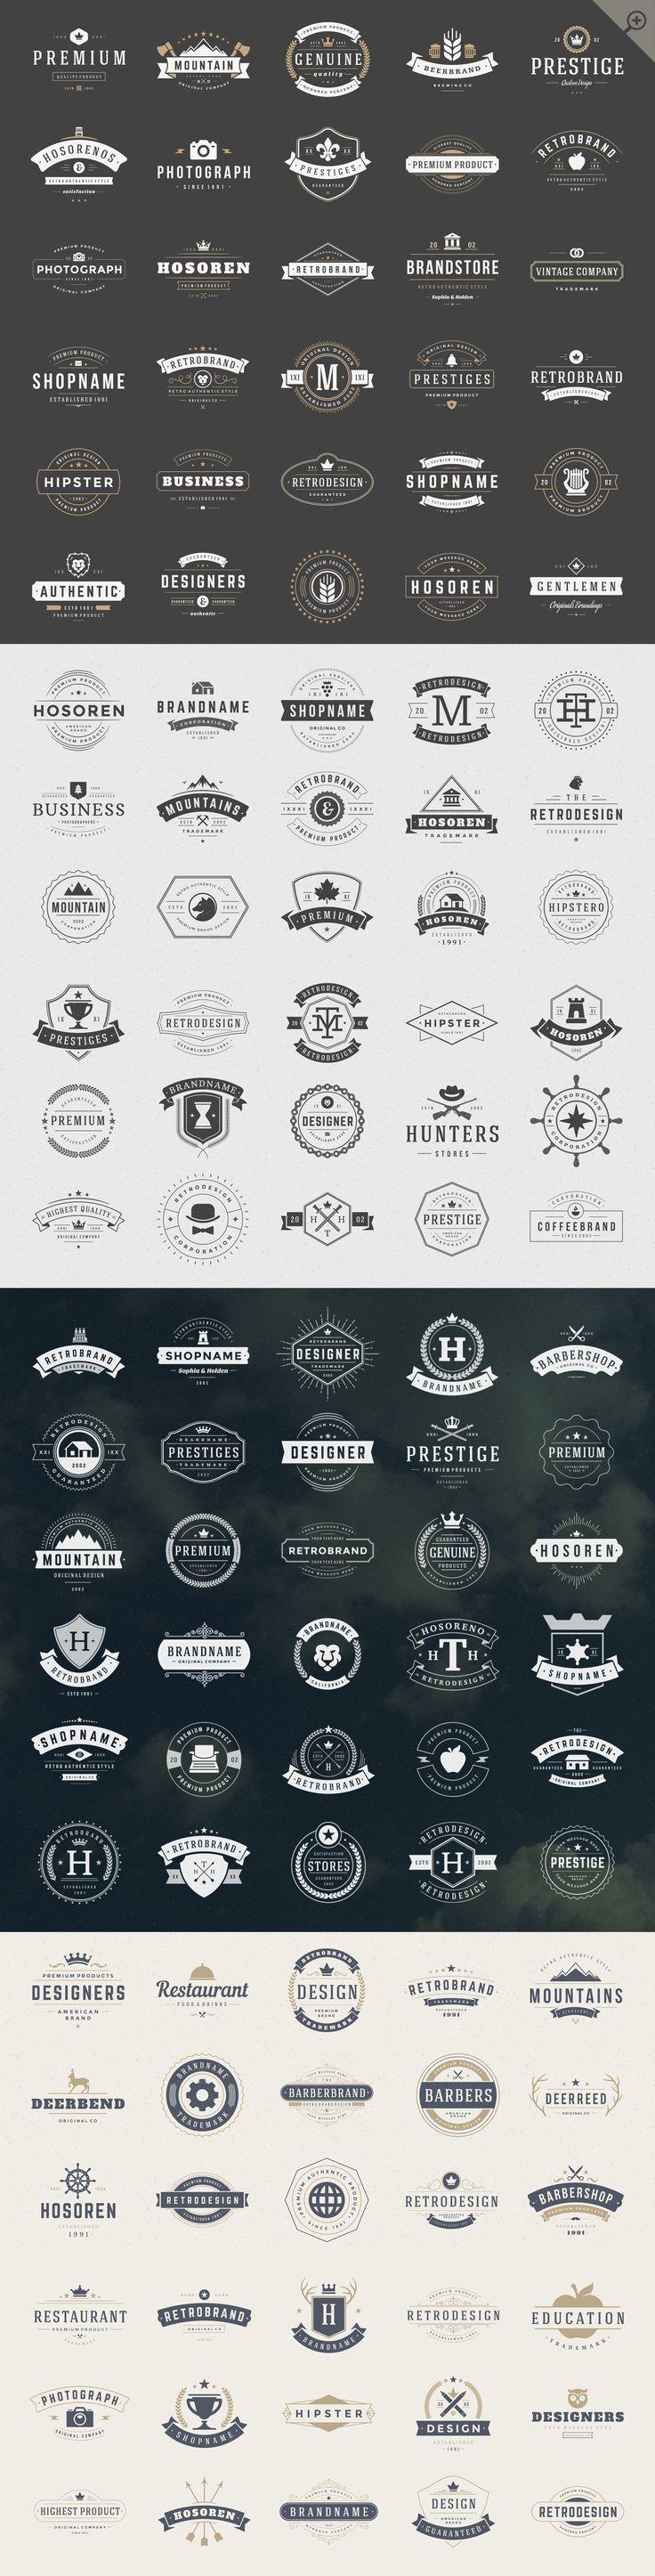 420 Vintage logotypes and badges by Vasya Kobelev on @creativemarket